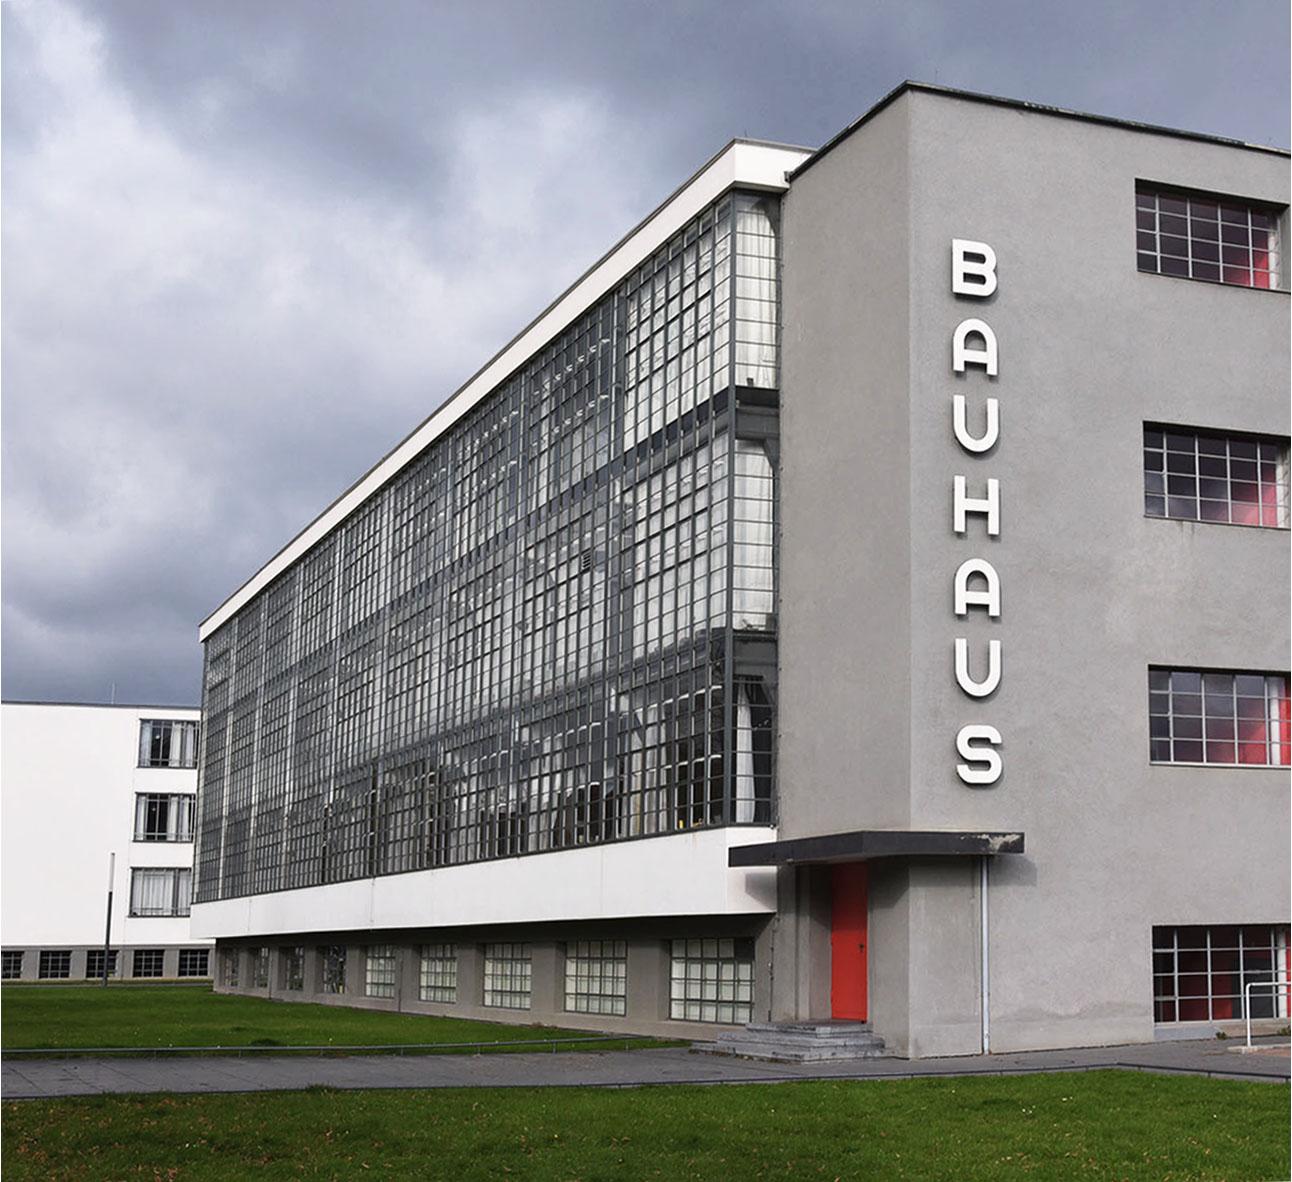 Murales Pared Bauhaus